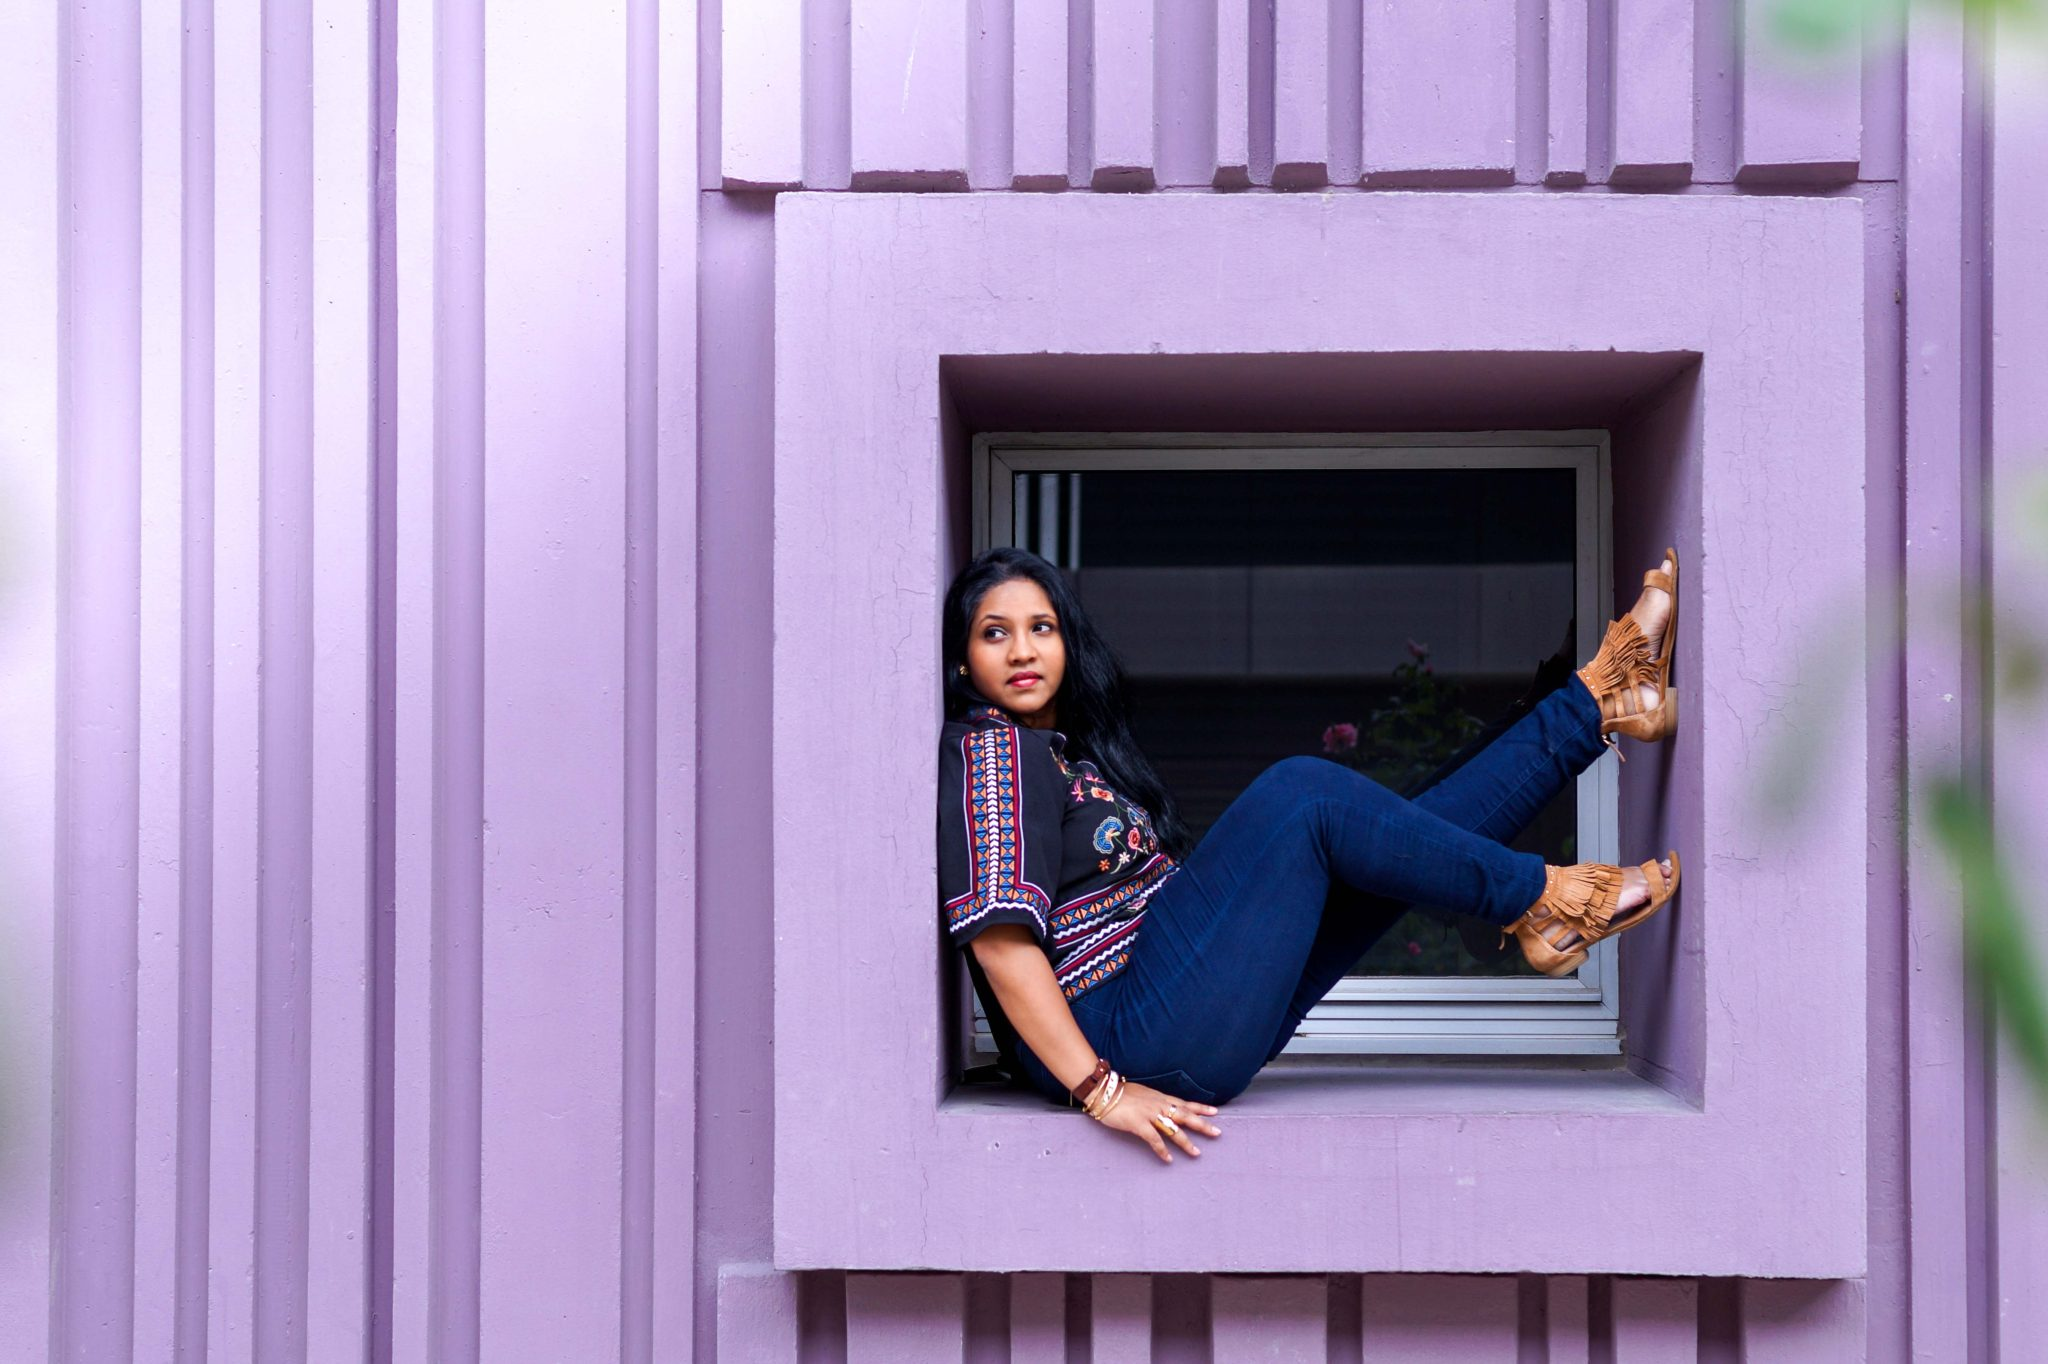 le secret du mur violet de beaugrenelle h ma pose ses valises. Black Bedroom Furniture Sets. Home Design Ideas